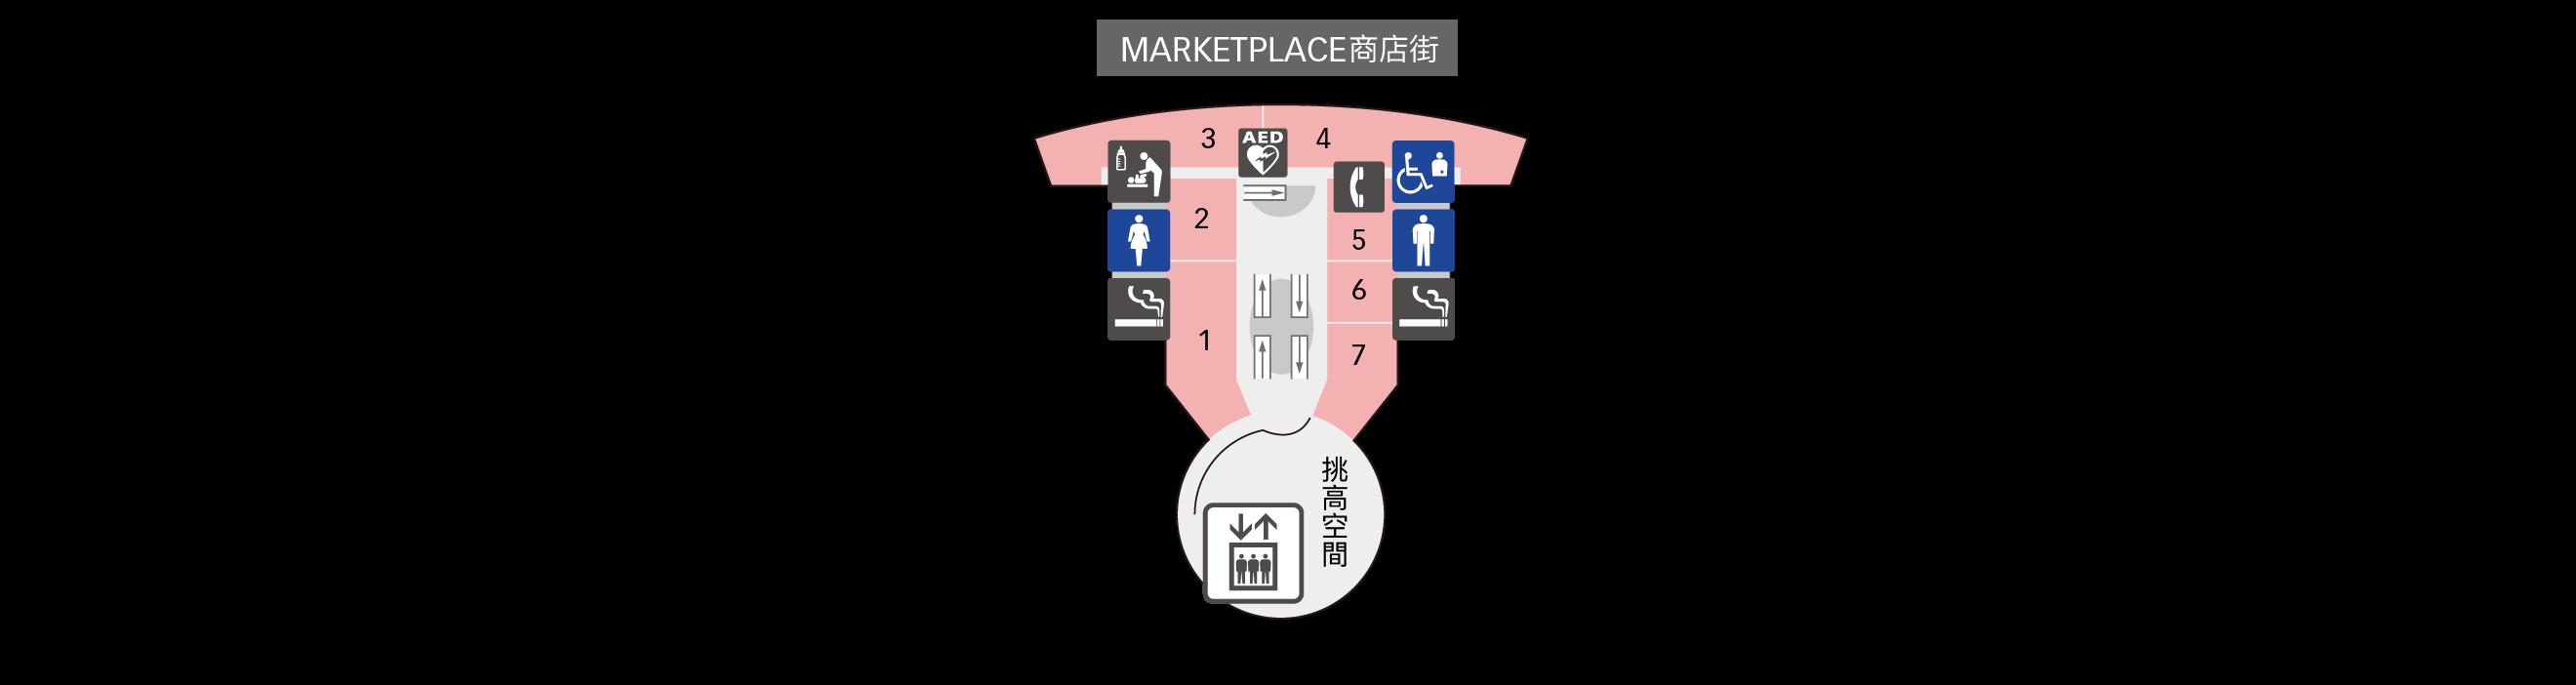 4F餐廳&商店樓層地圖